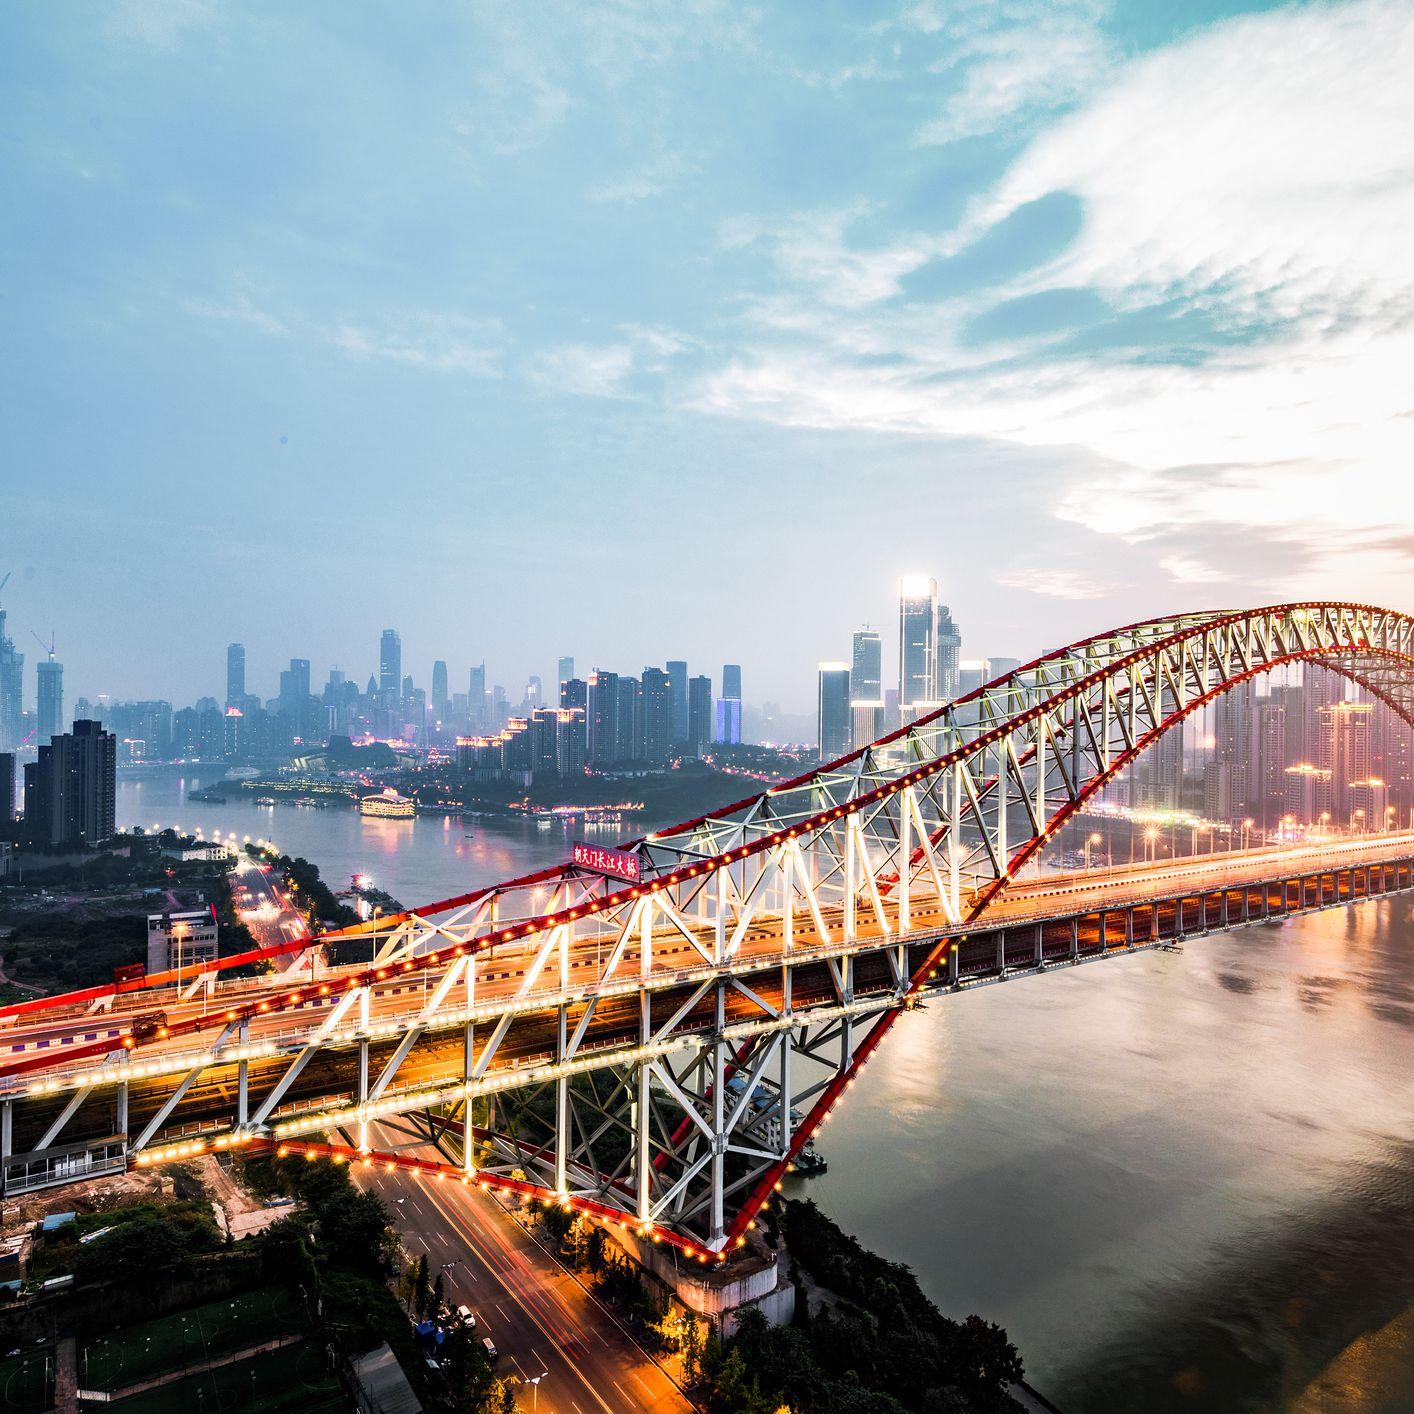 11 Best Things To Do in Chongqing, China